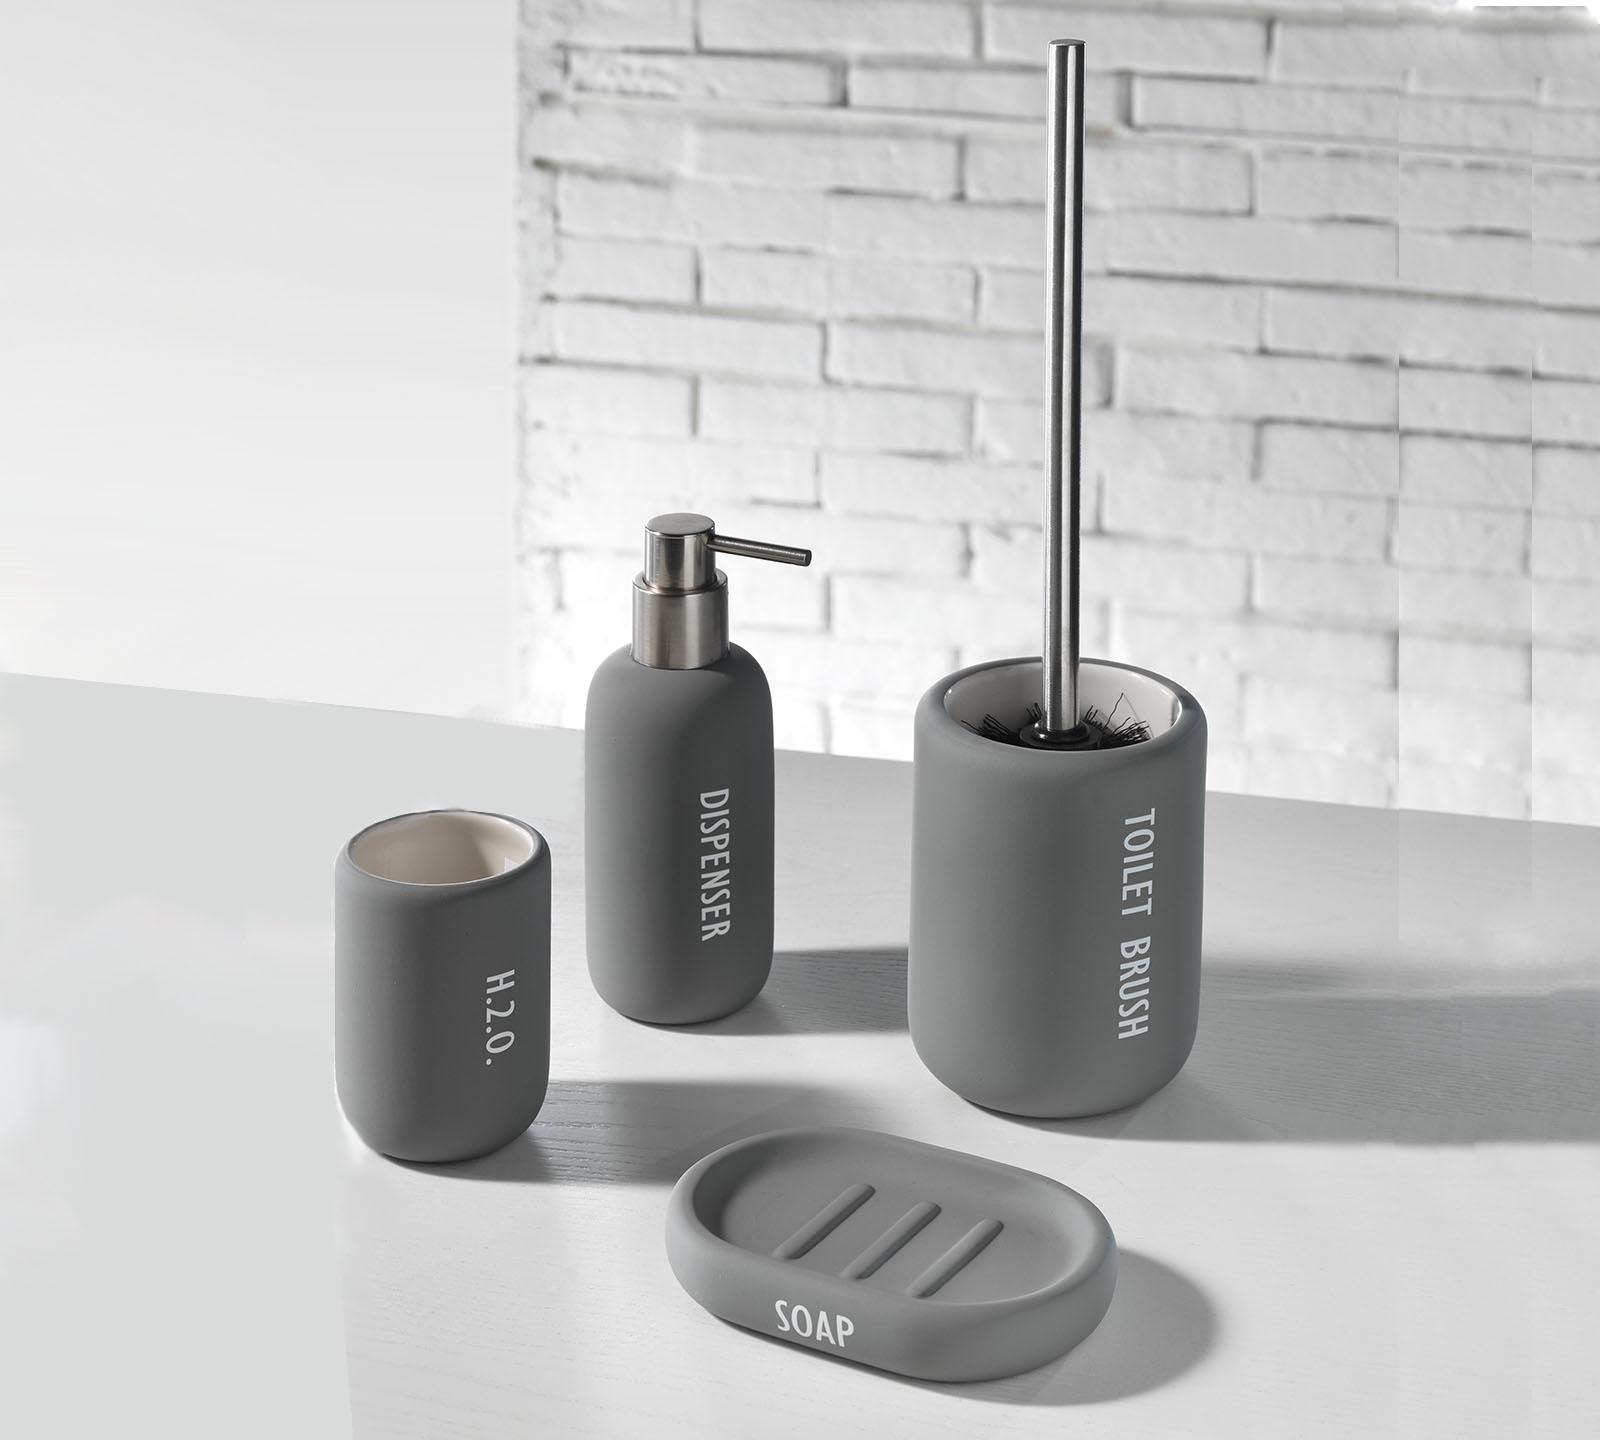 Set accessori bagno tft cod 1010 ru gray duzzle - Tft arredobagno ...